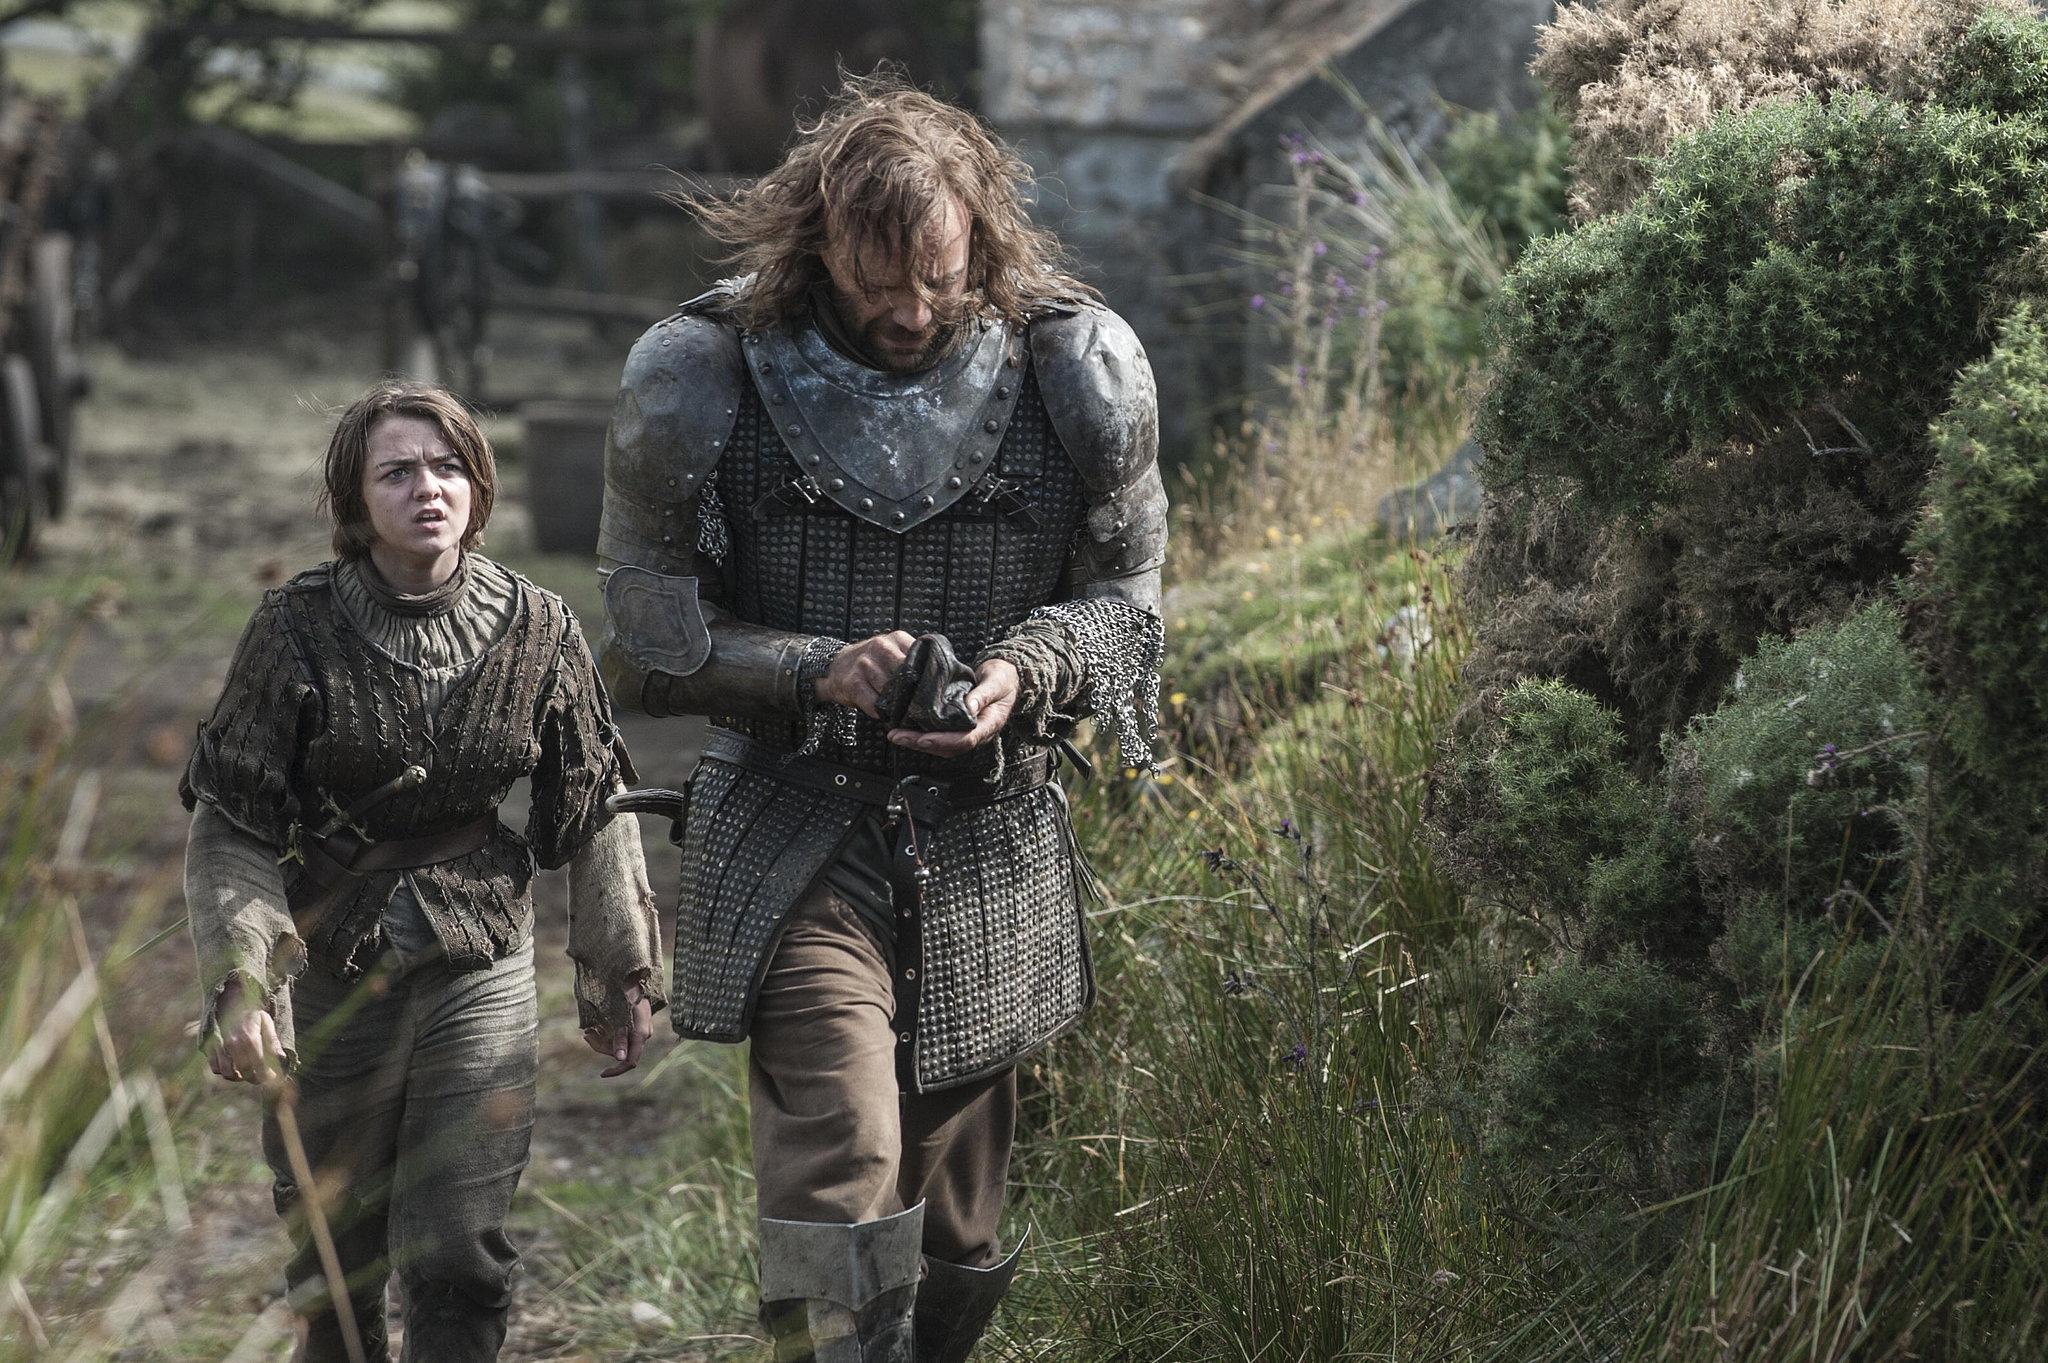 Maisie Williams as Arya Stark and Rory McCann as The Hound.